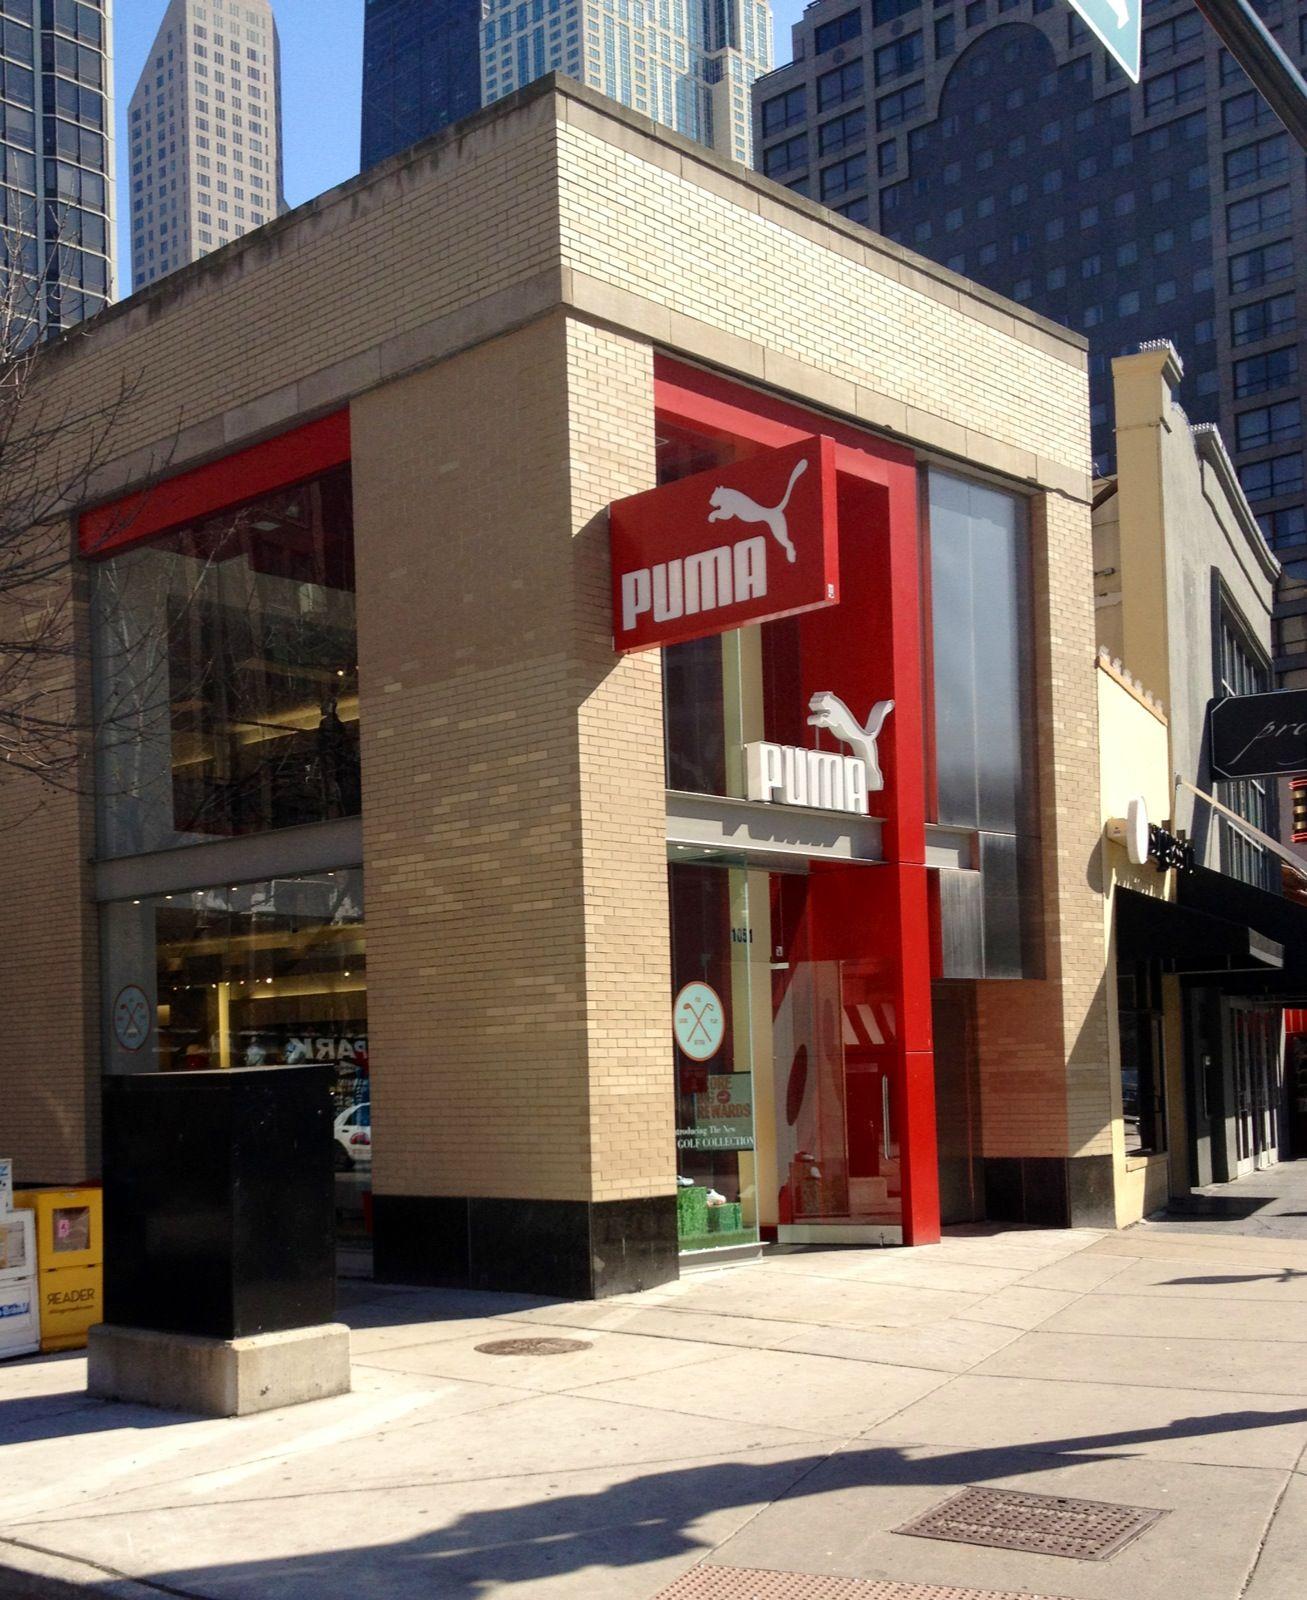 The PUMA Store on Rush Street, Chicago, IL #PUMA #retail #shopping